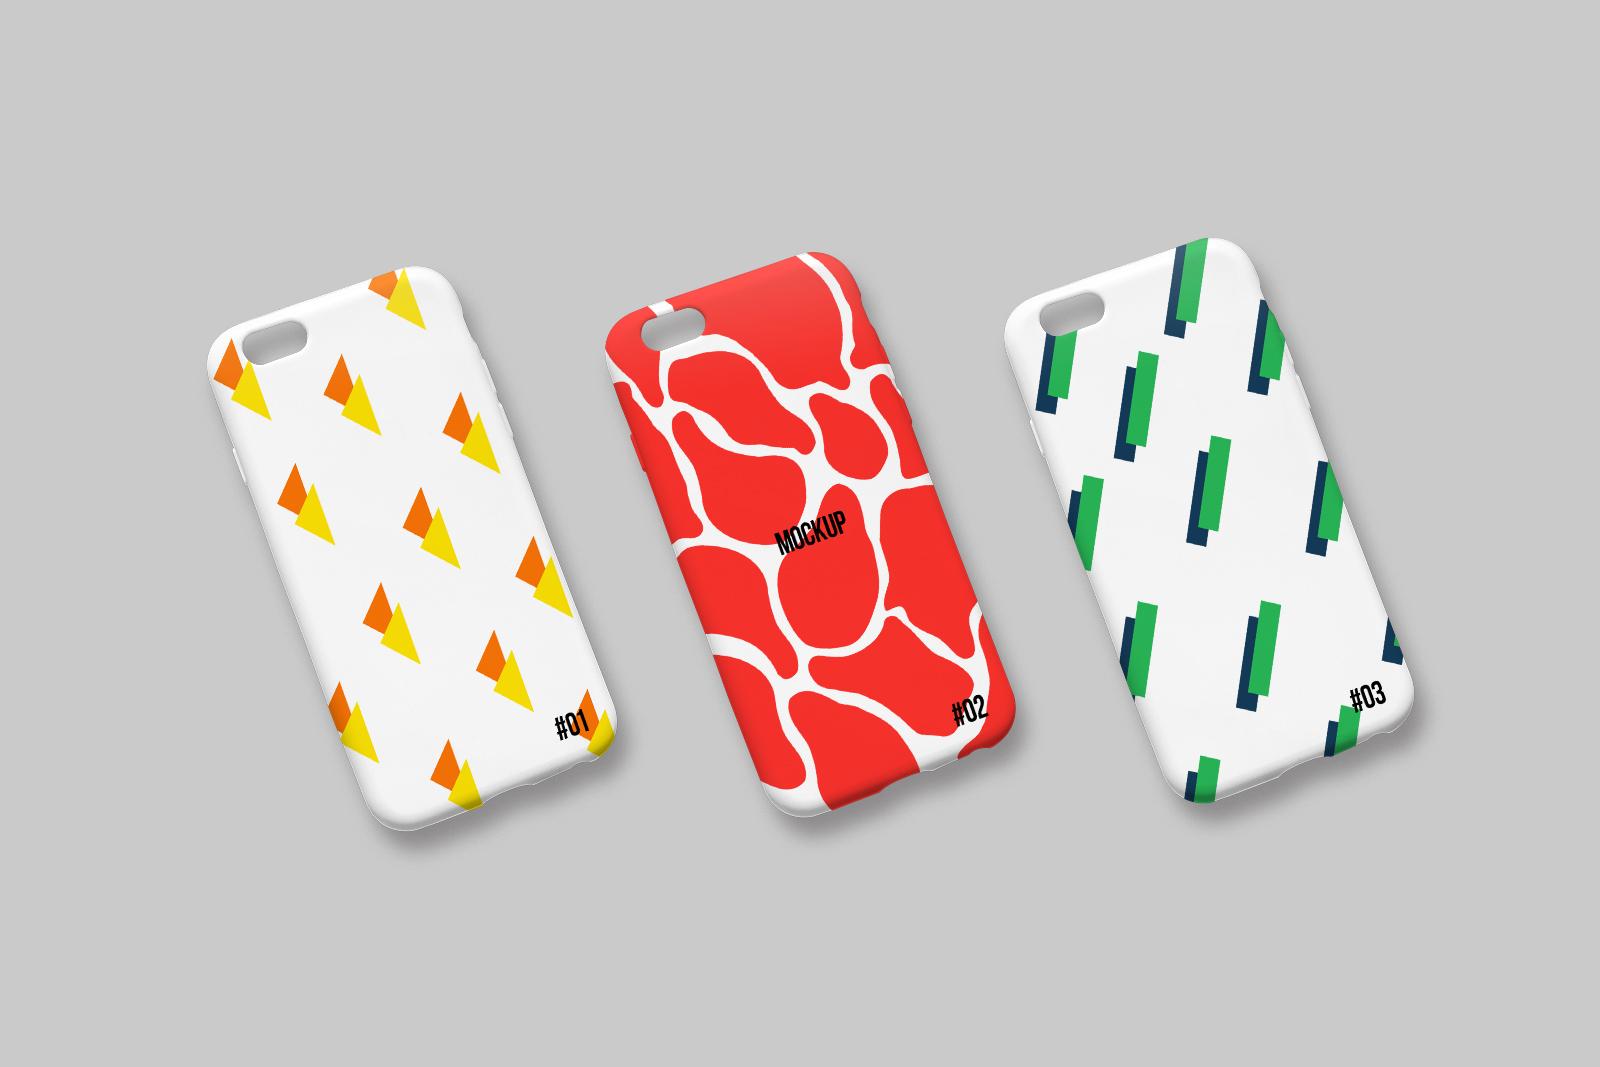 Free Iphone Case Mockup PSD